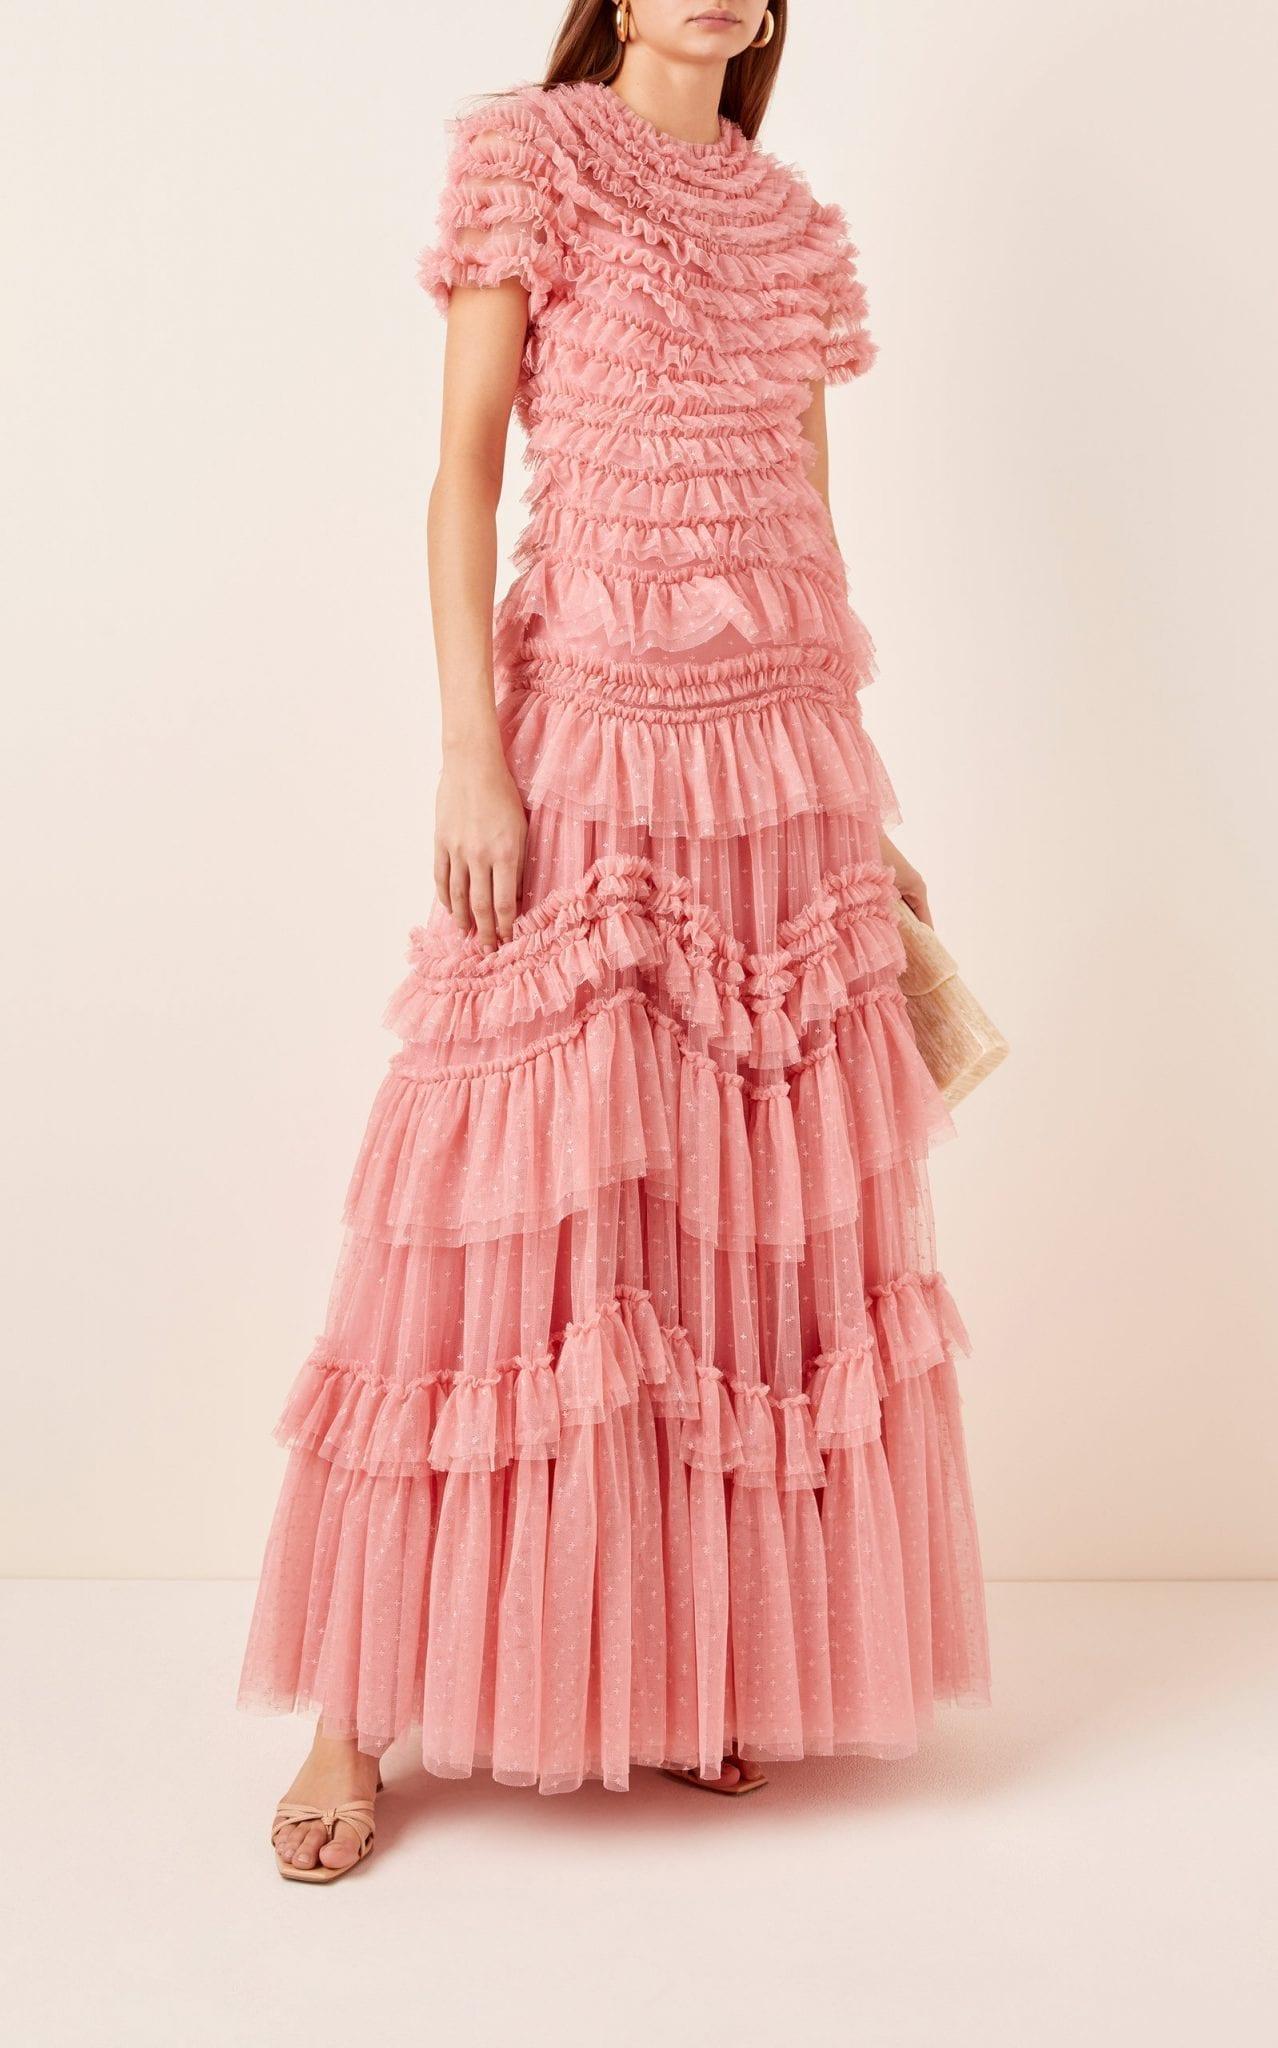 NEEDLE & THREAD Wild Rose Ruffled Chiffon Gown